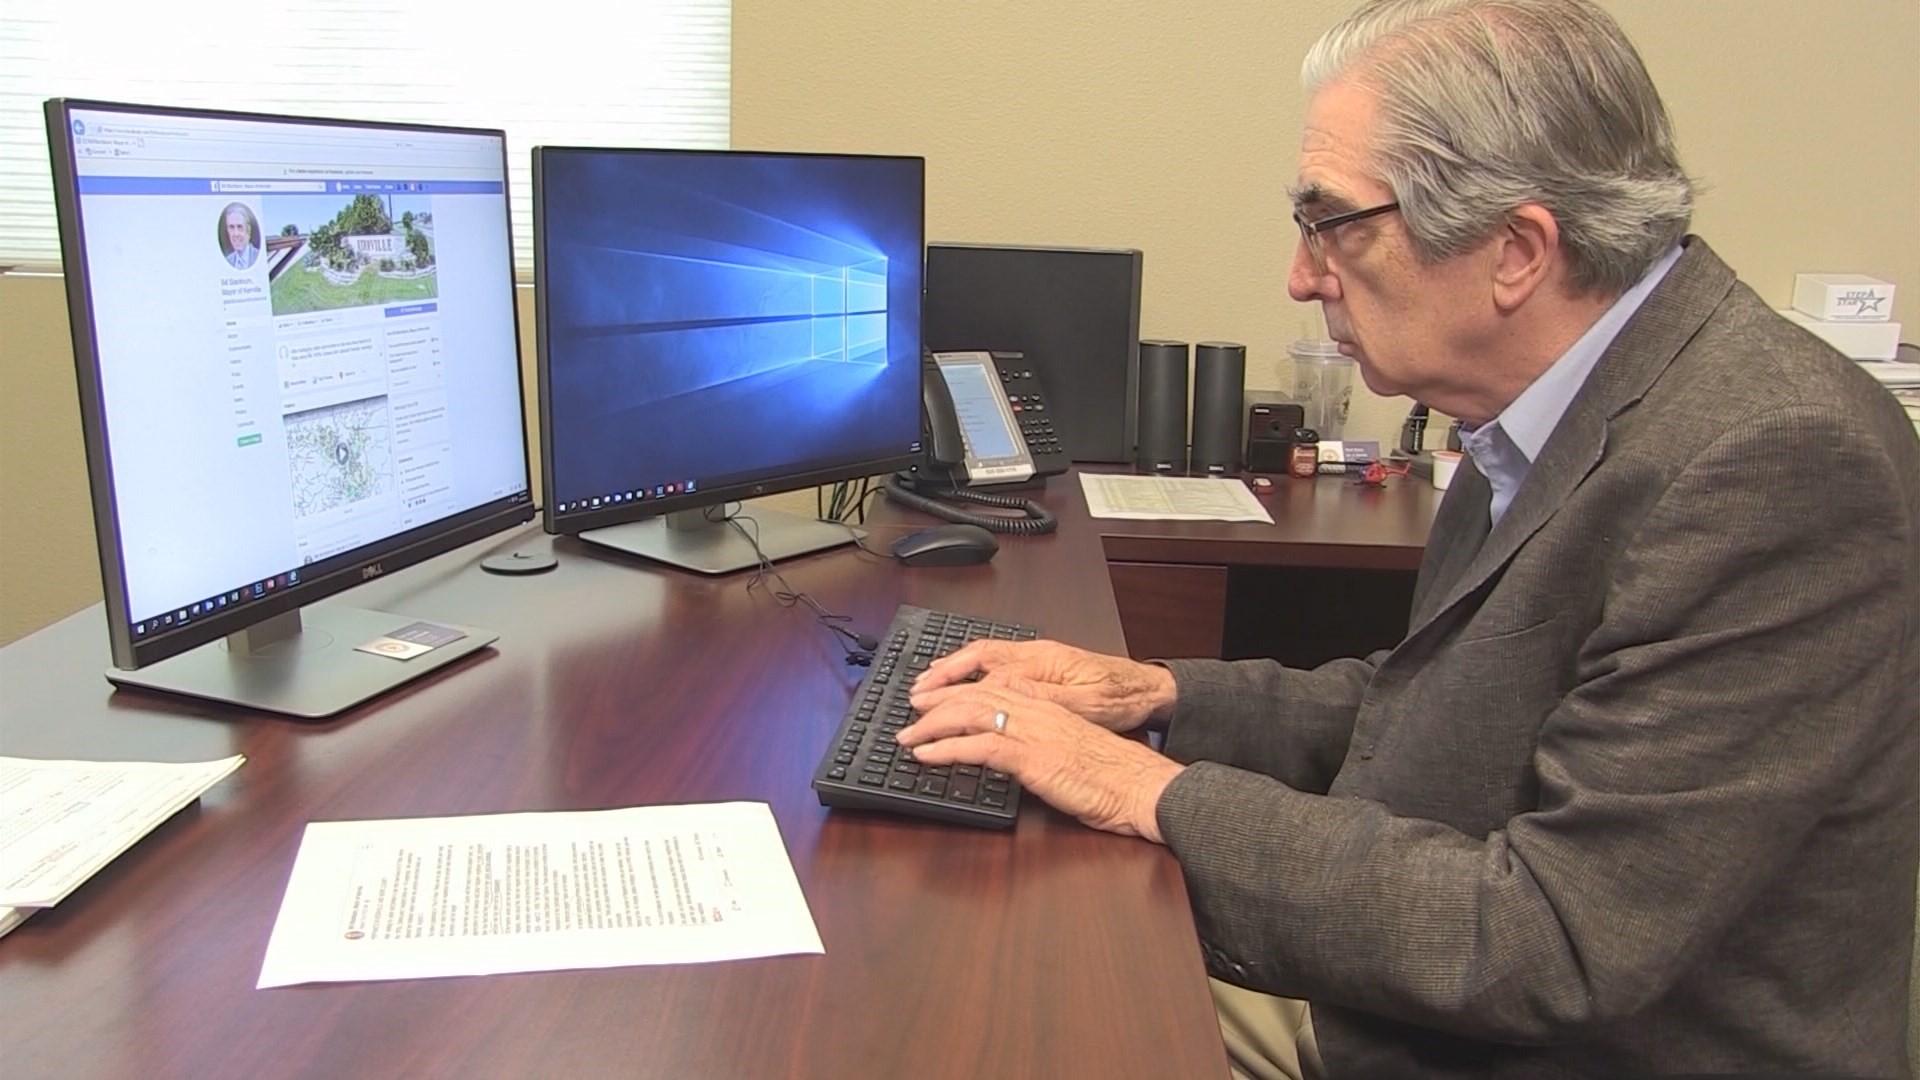 Kerrville mayor urges support for Hispanic neighbors | kens5.com